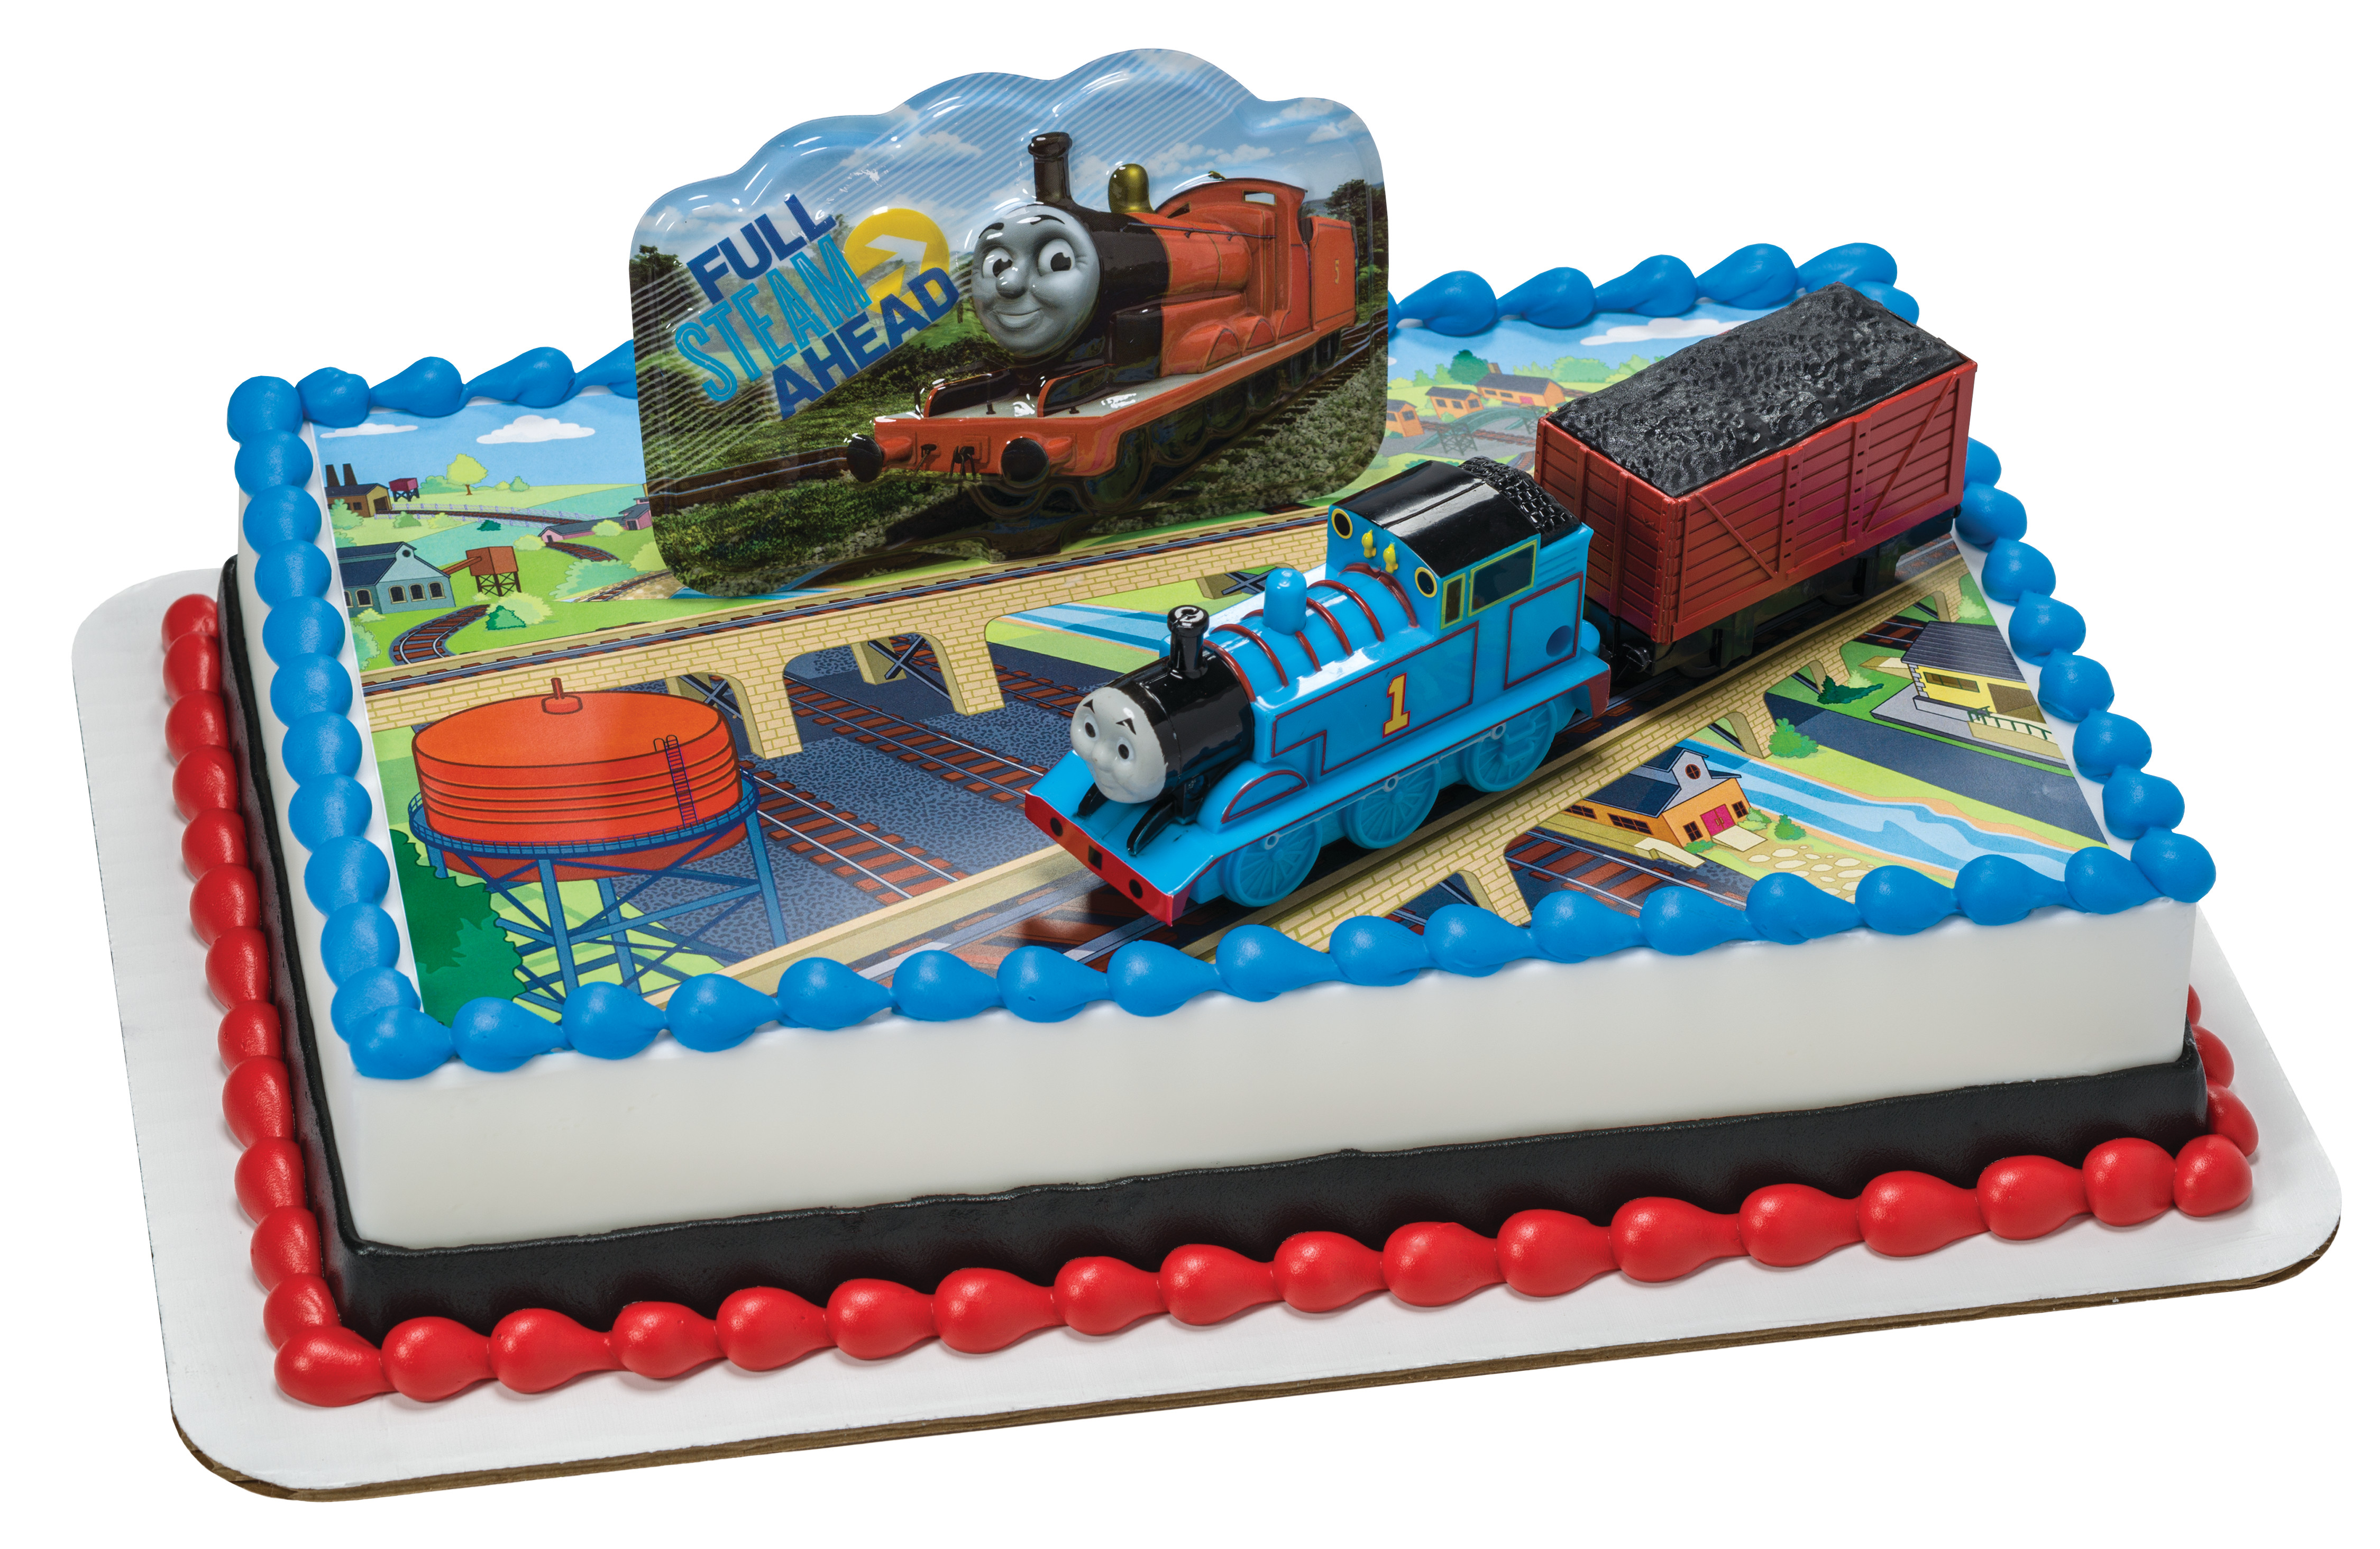 Thomas Amp Friends Coal Car Photocake 174 Decoset 174 Background